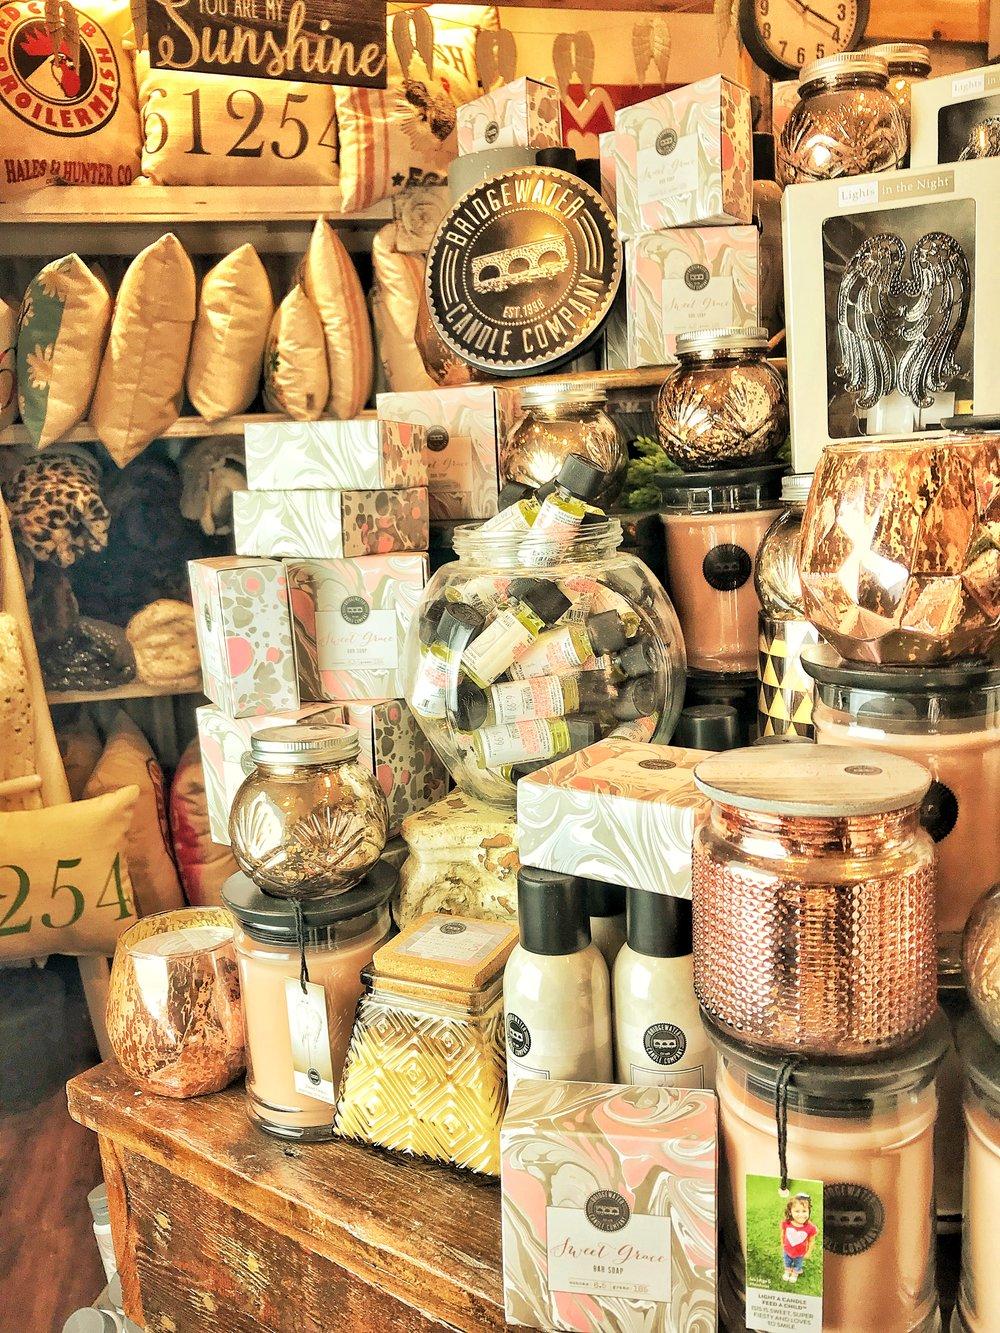 Bridgewater Candle Company: Sweet Grace candles, $23.99; Sweet Grace bar soap, $11.99; Sweet Grace body lotion, $11.99 -       96       Normal  0          false  false  false    EN-US  ZH-CN  AR-SA                                                                                                                                                                                                                                                                                                                                                                                                                                                                                                                                                                                                                                                                                                                                                                                                                                                         /* Style Definitions */ table.MsoNormalTable {mso-style-name: